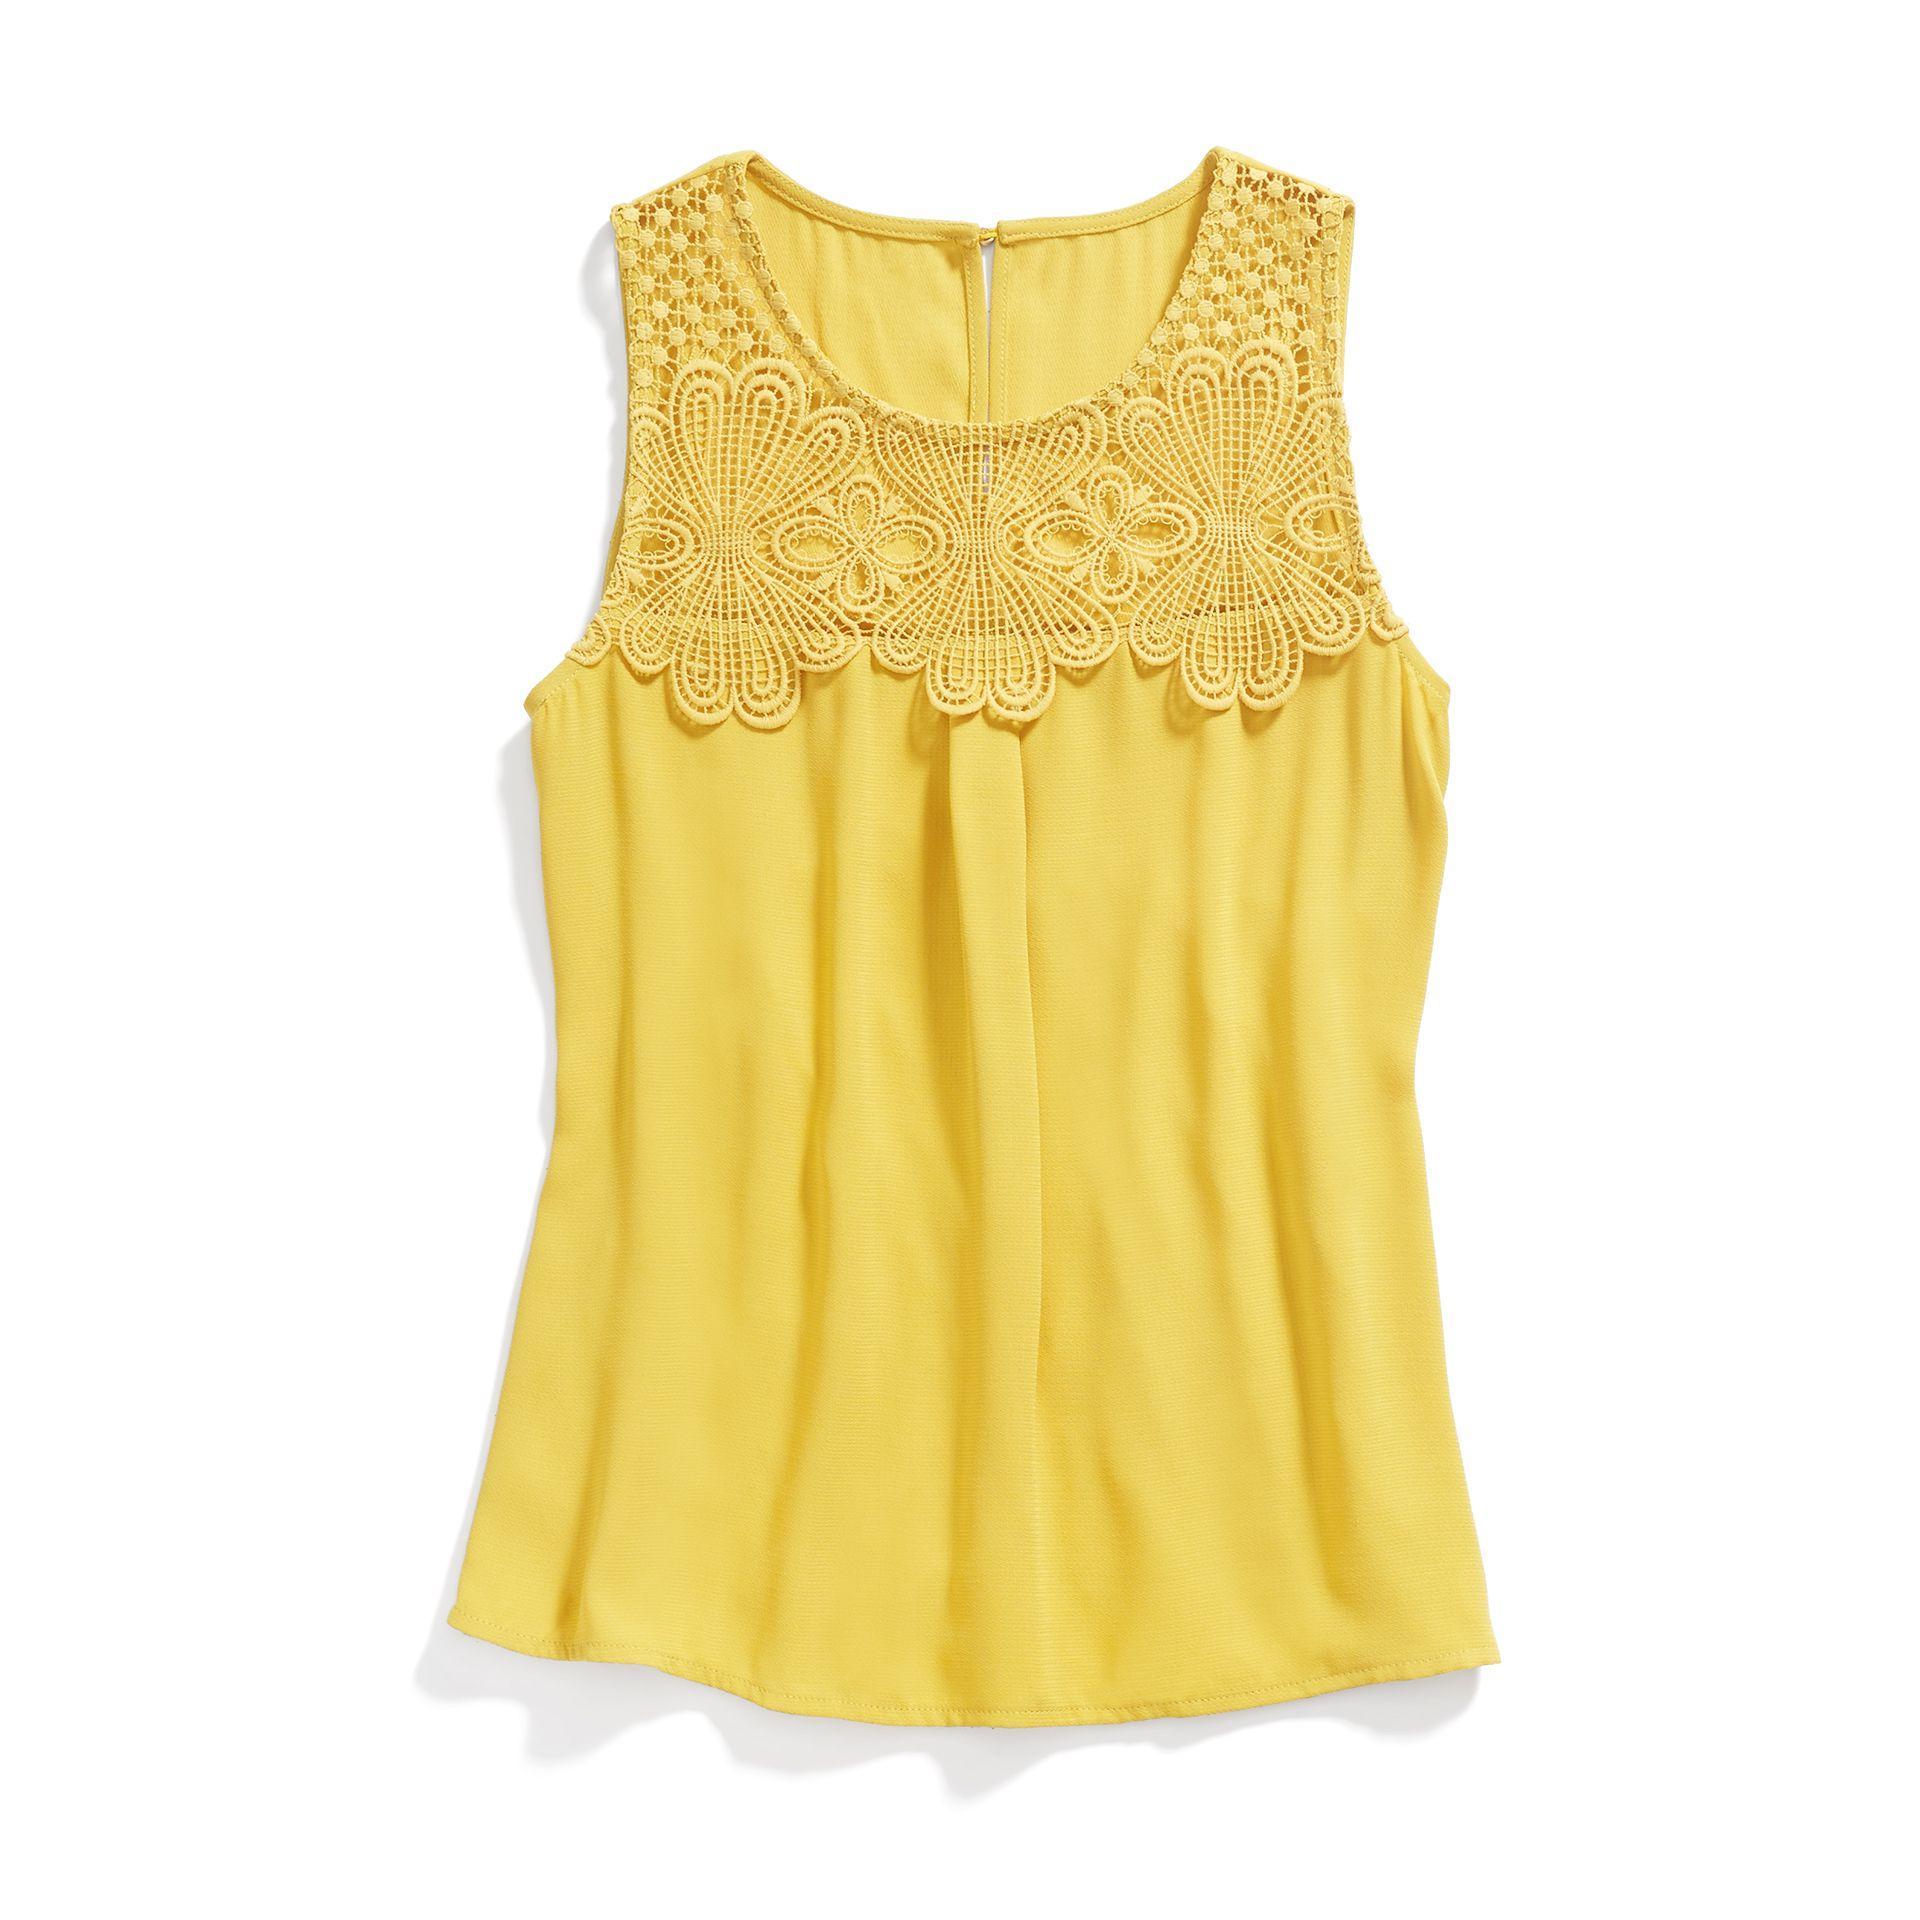 c335fad2af3360 Stitch Fix Fall Color Trends  Mustard